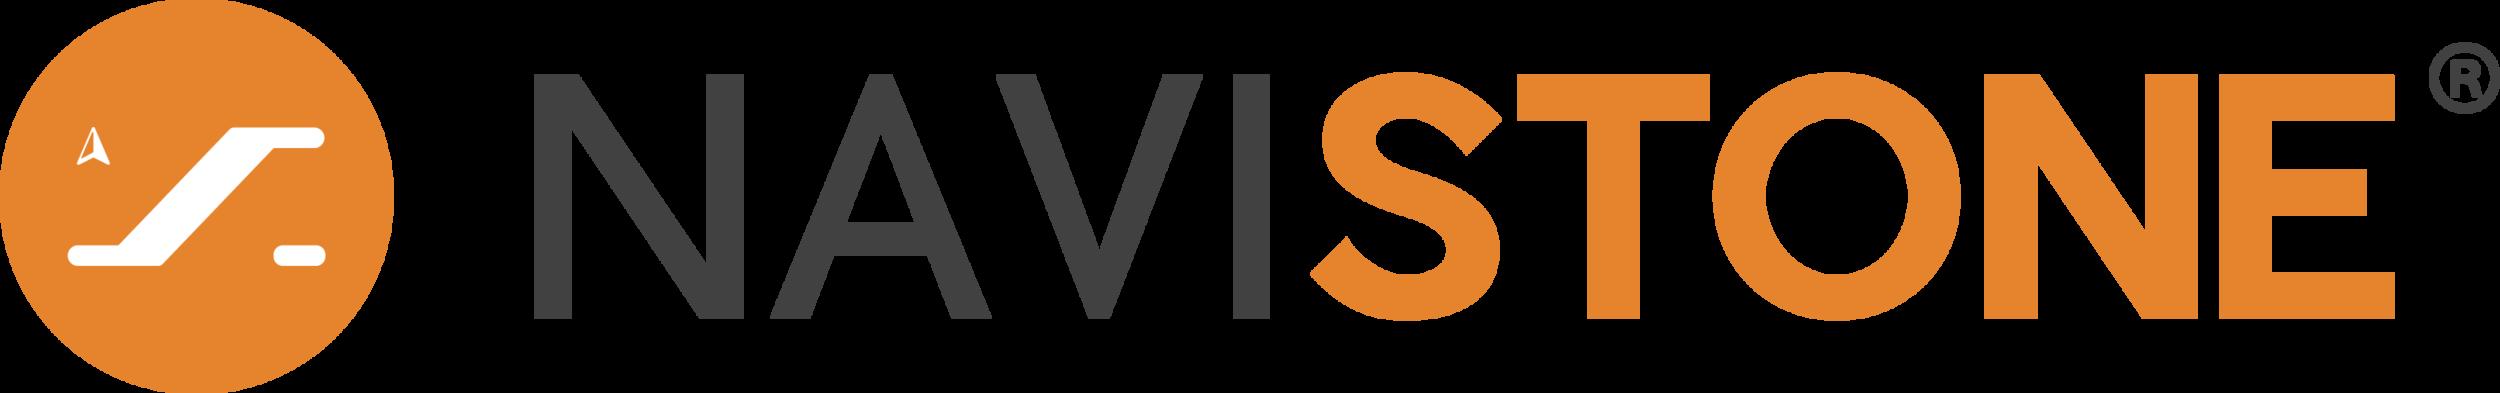 navistone-logo-print.png